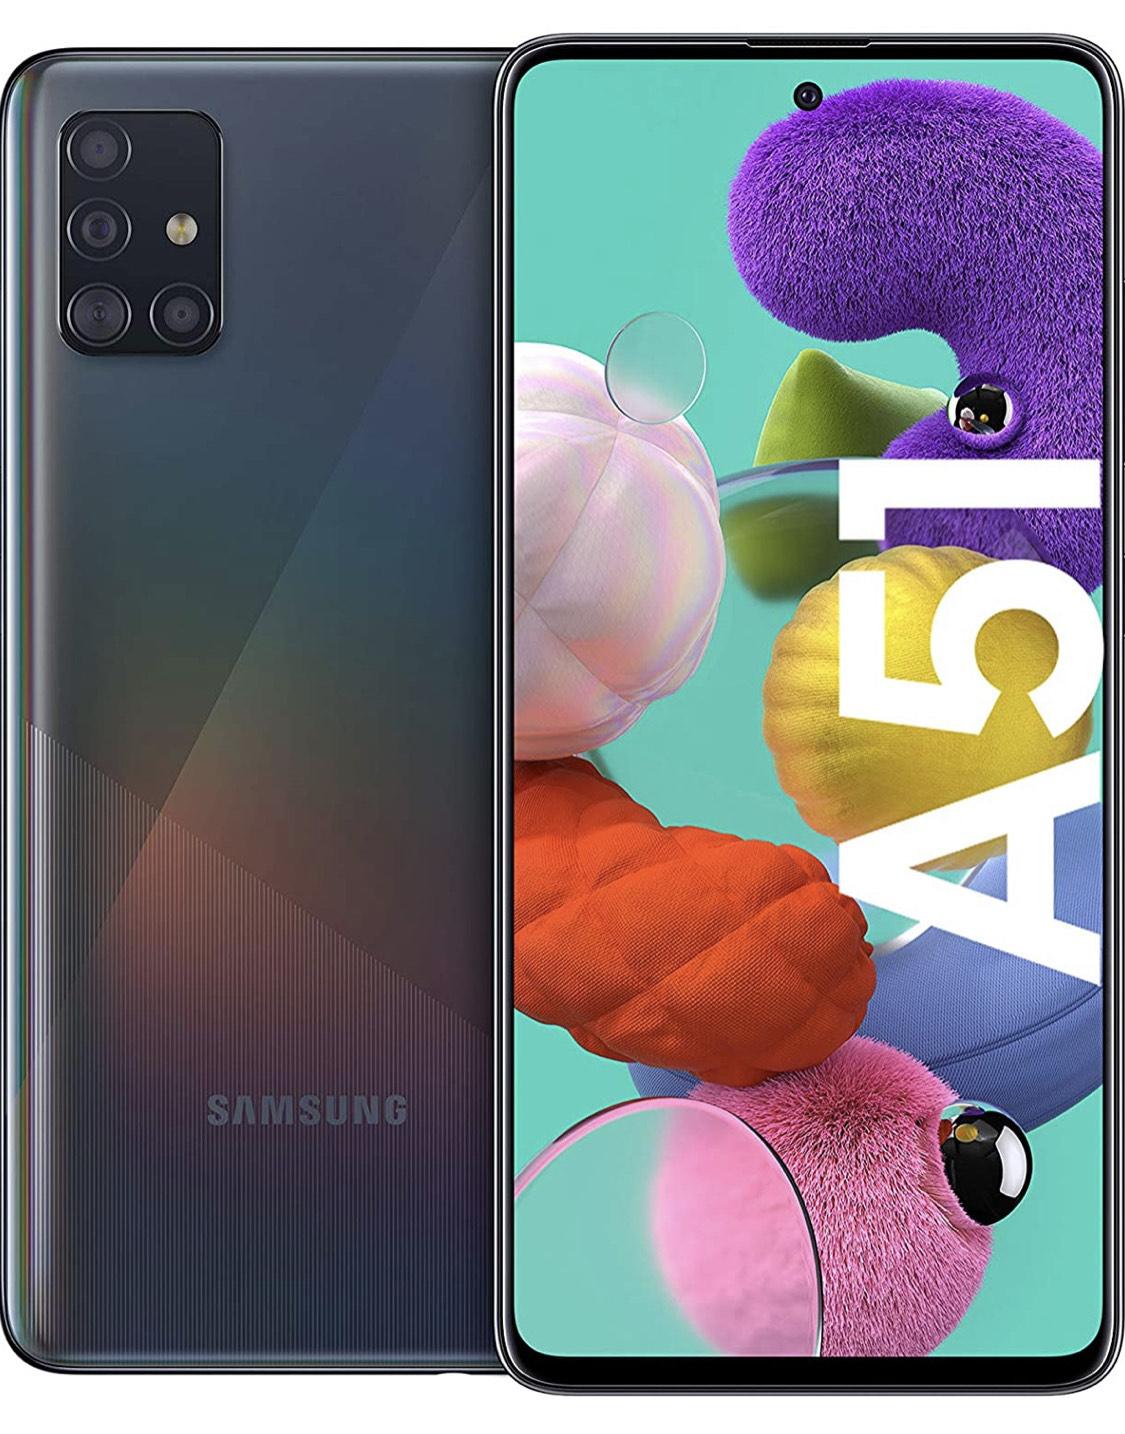 Samsung Galaxy A51 f. 219€ inkl. Versand bei Amazon